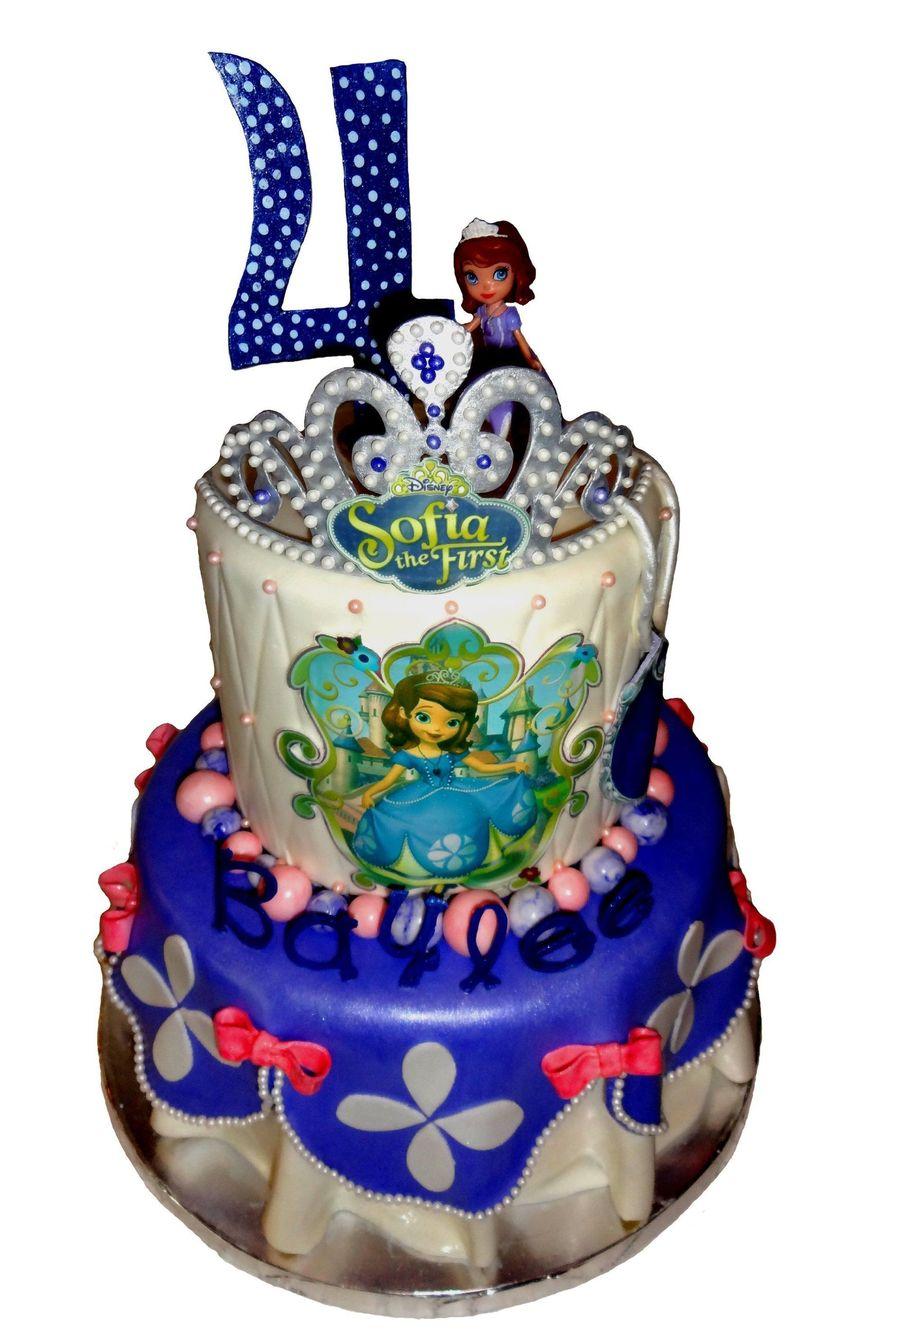 Awe Inspiring Princess Sofia The First 4Th Birthday Cake Cakecentral Com Funny Birthday Cards Online Inifodamsfinfo